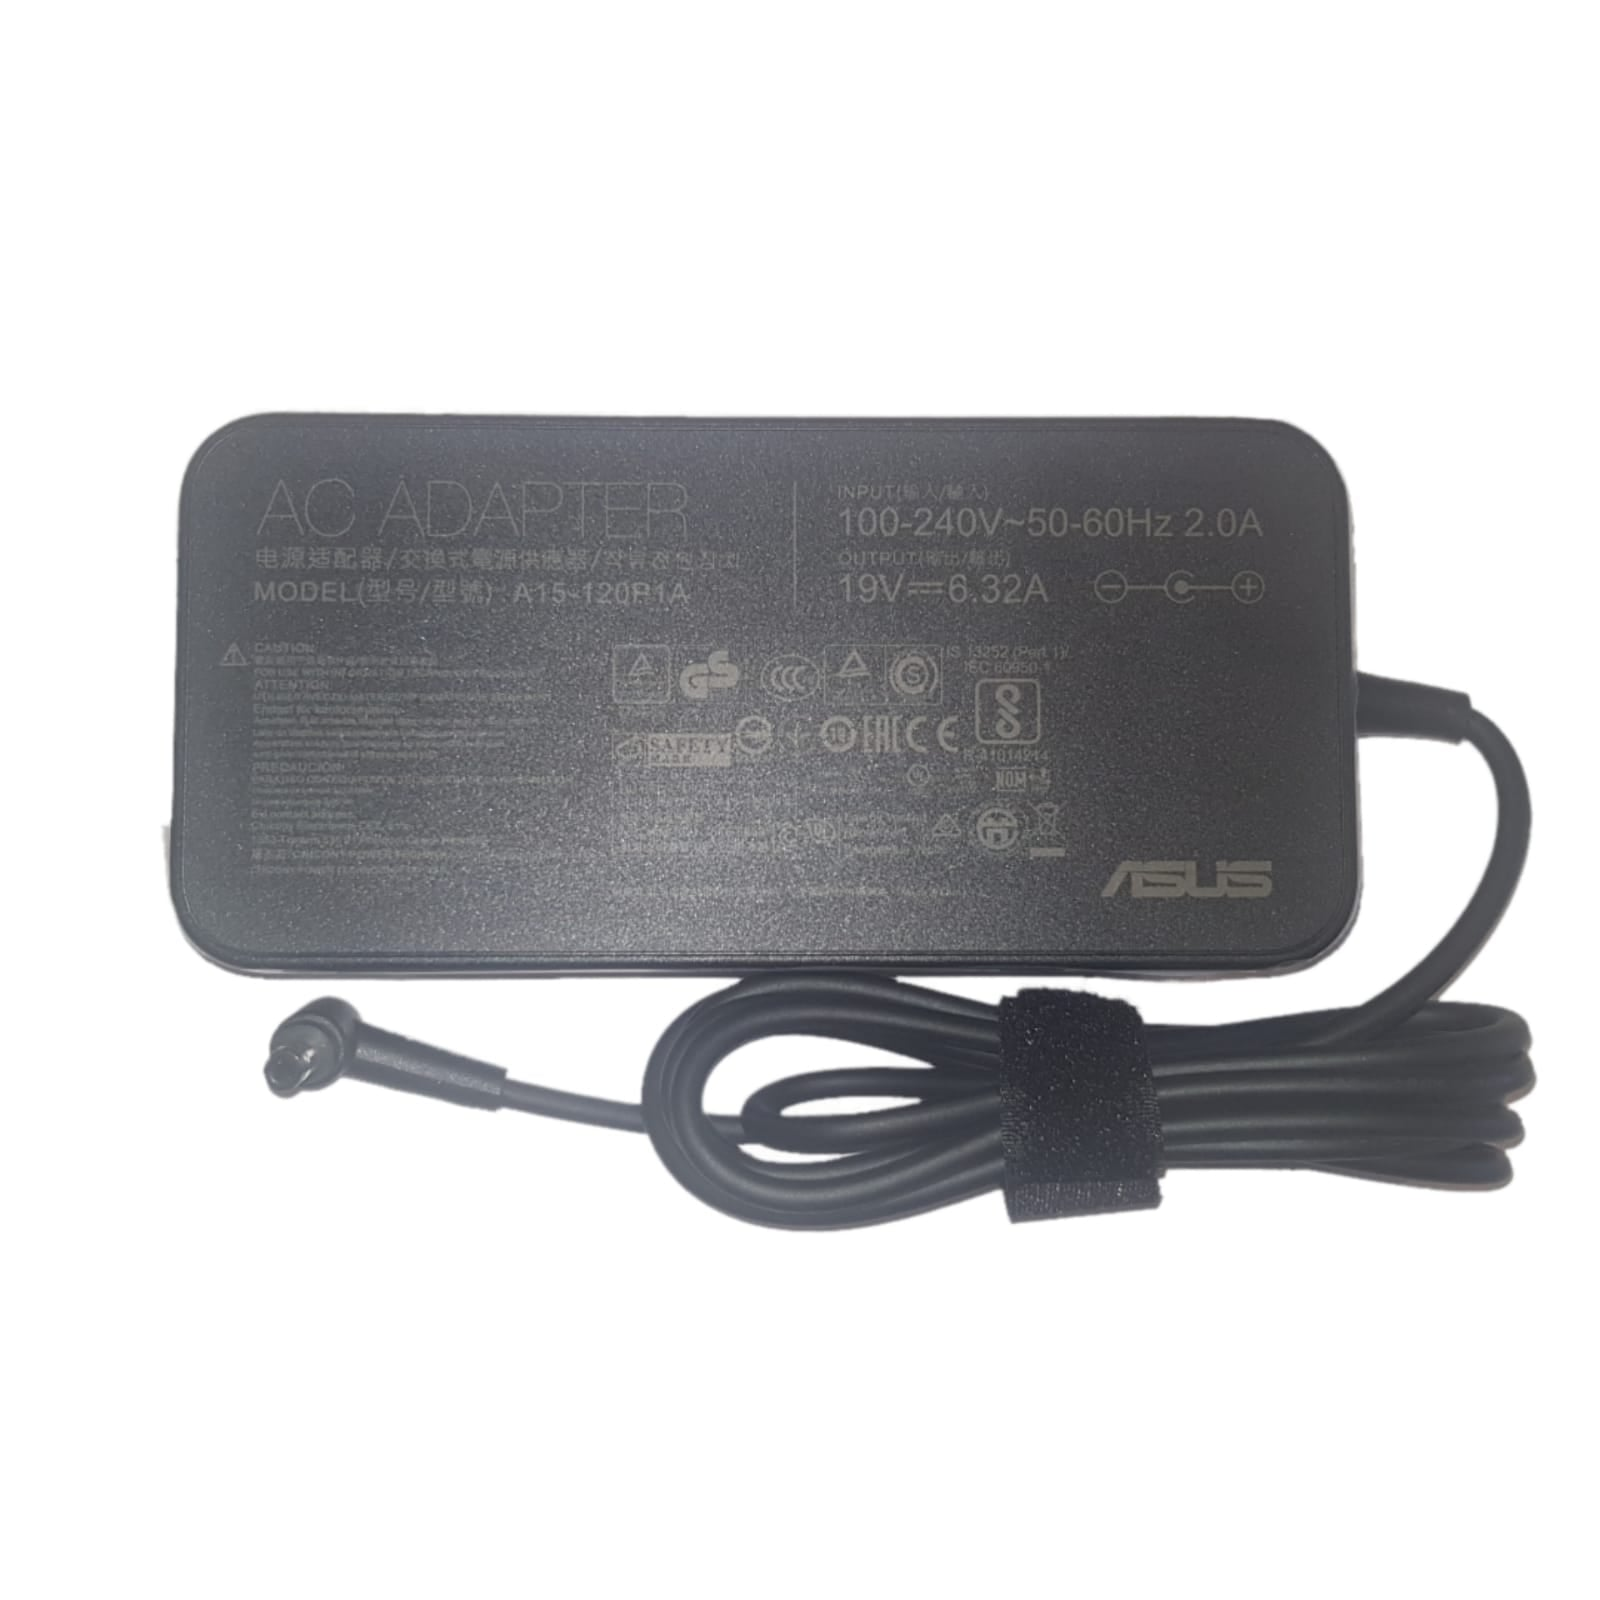 מטען למחשב נייד אסוס Asus 19V - 6.32A 4.5*3.0 120W